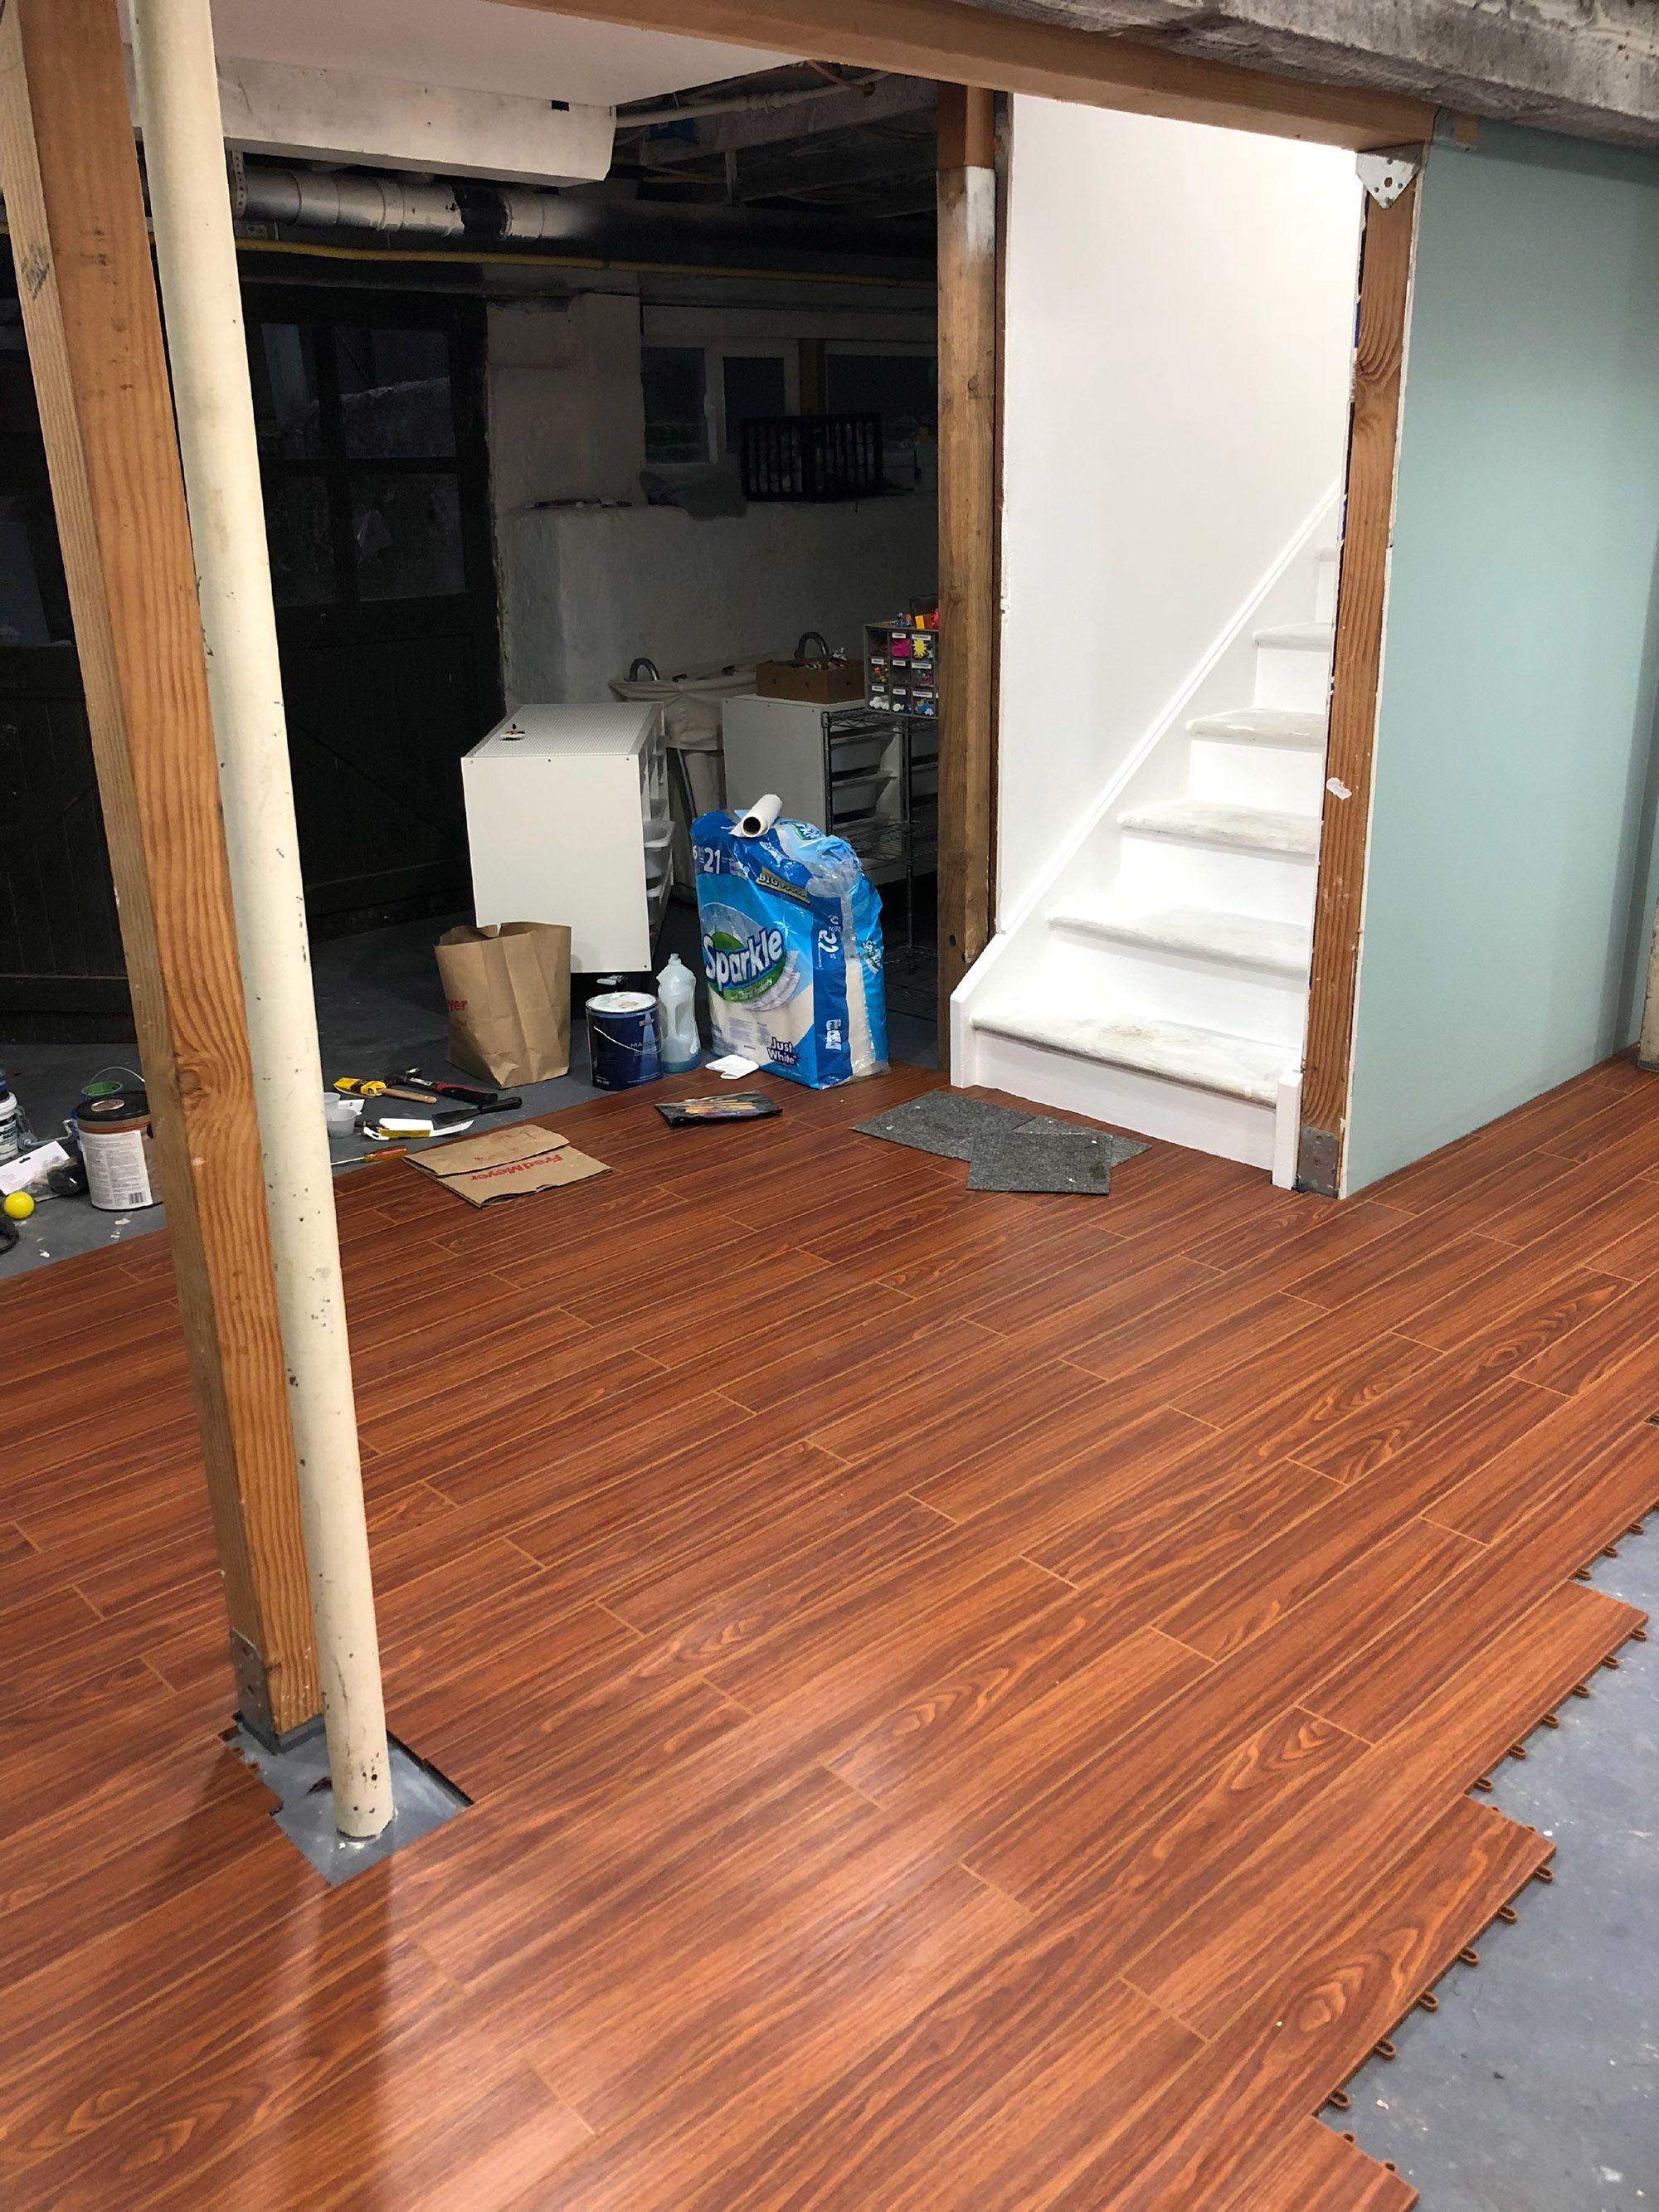 Plankflex Vinyl Wood Grain Plank Flooring Tiles Modular Floors Basement Remodeling Floating Floor Basement Layout